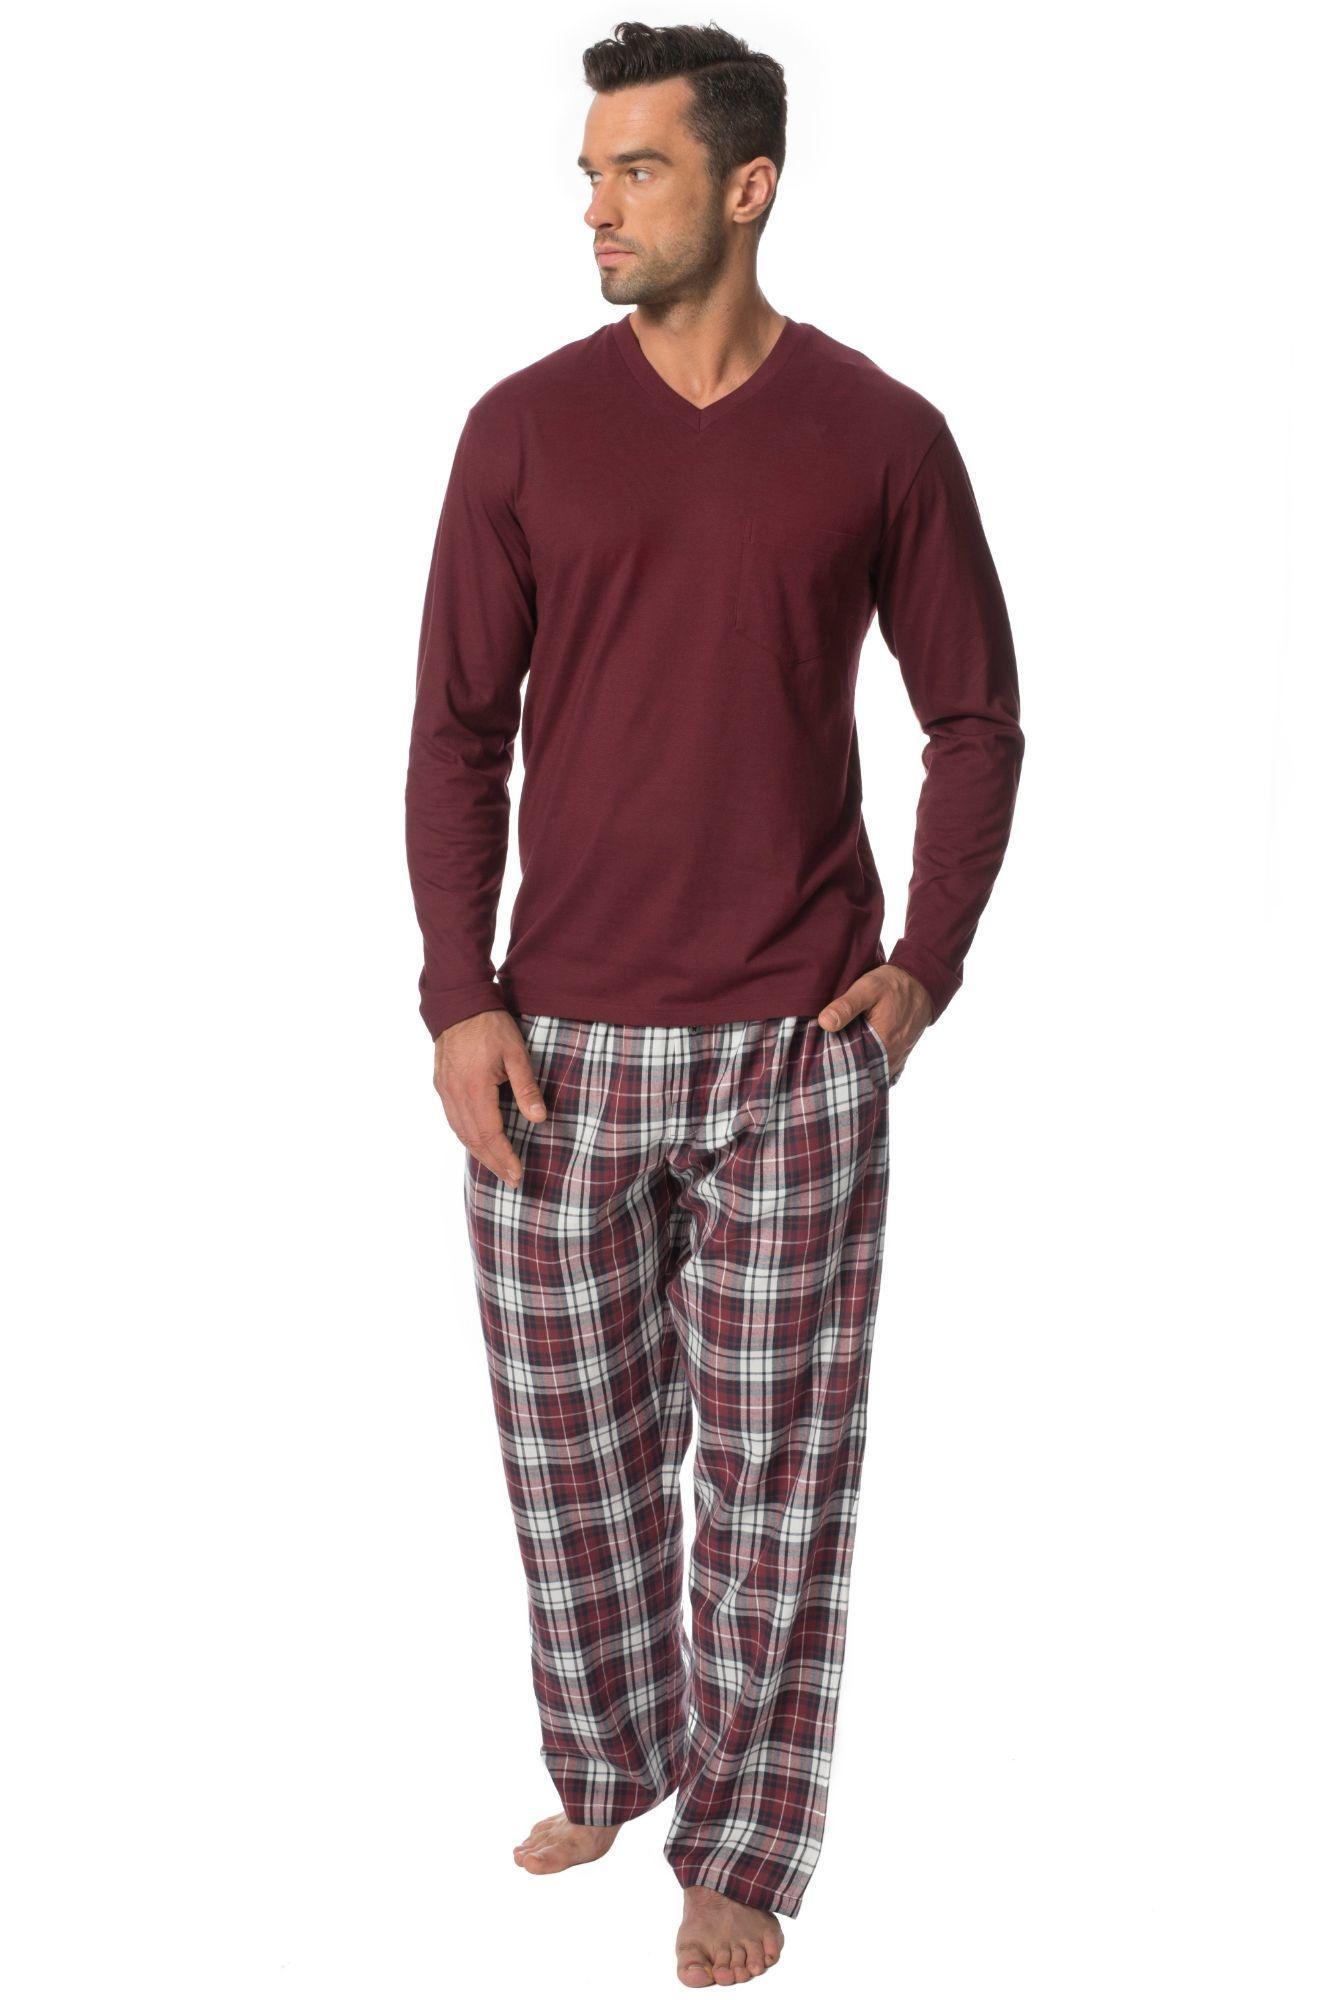 f3ce8af16de4 Pánske bavlnené pyžamo Danny vínové - ELEGANT.sk